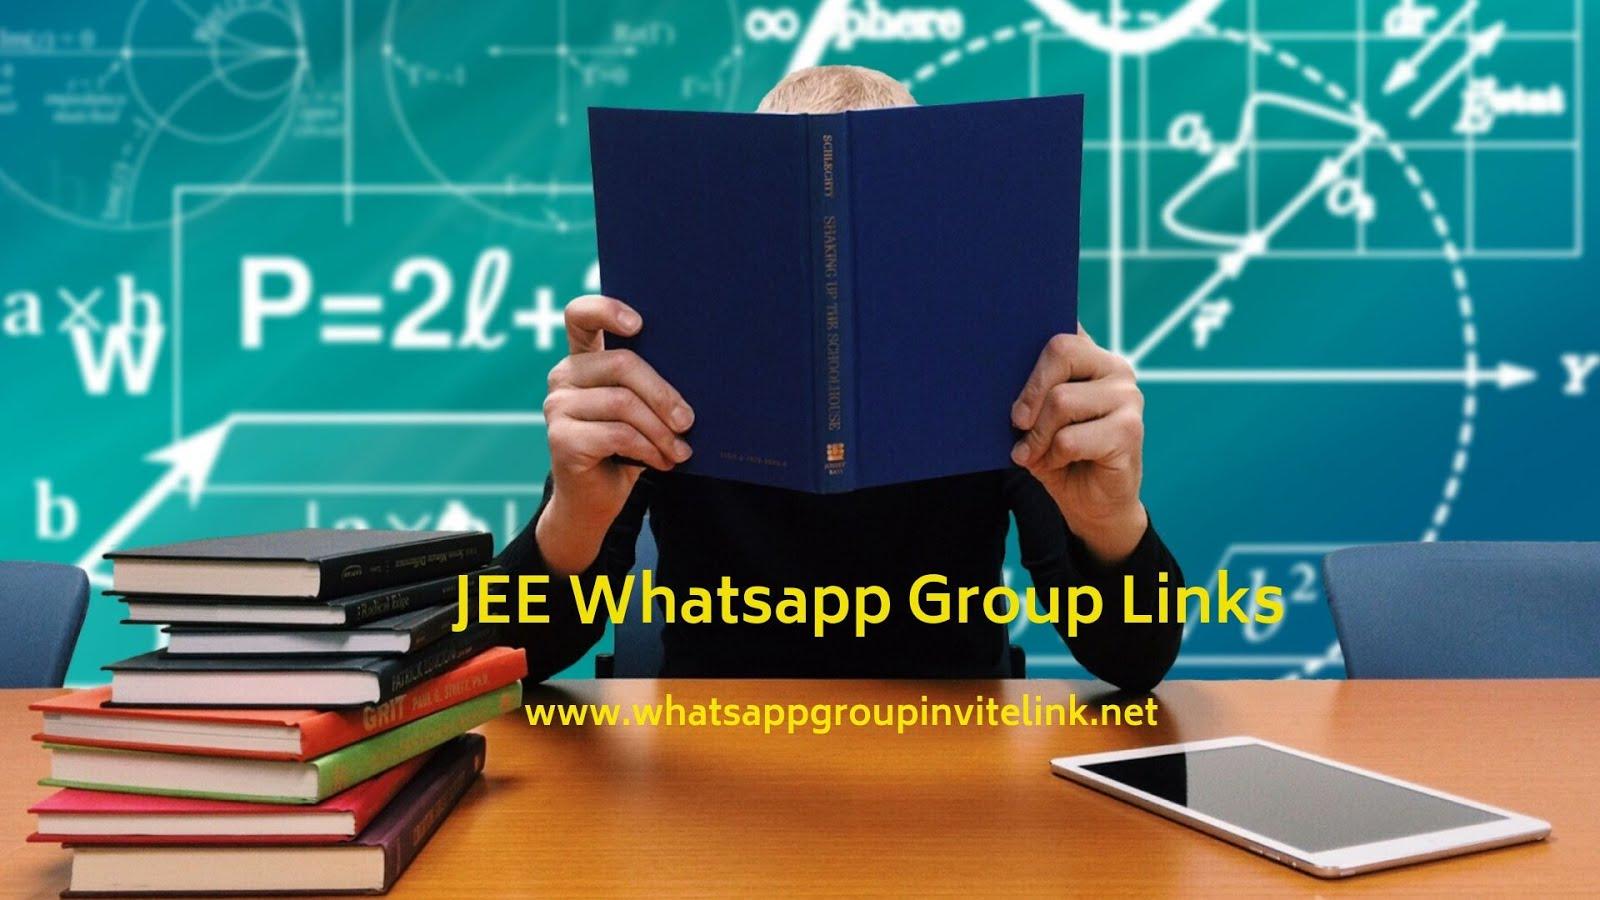 Whatsapp Group Invite Links: JEE Whatsapp Group Links